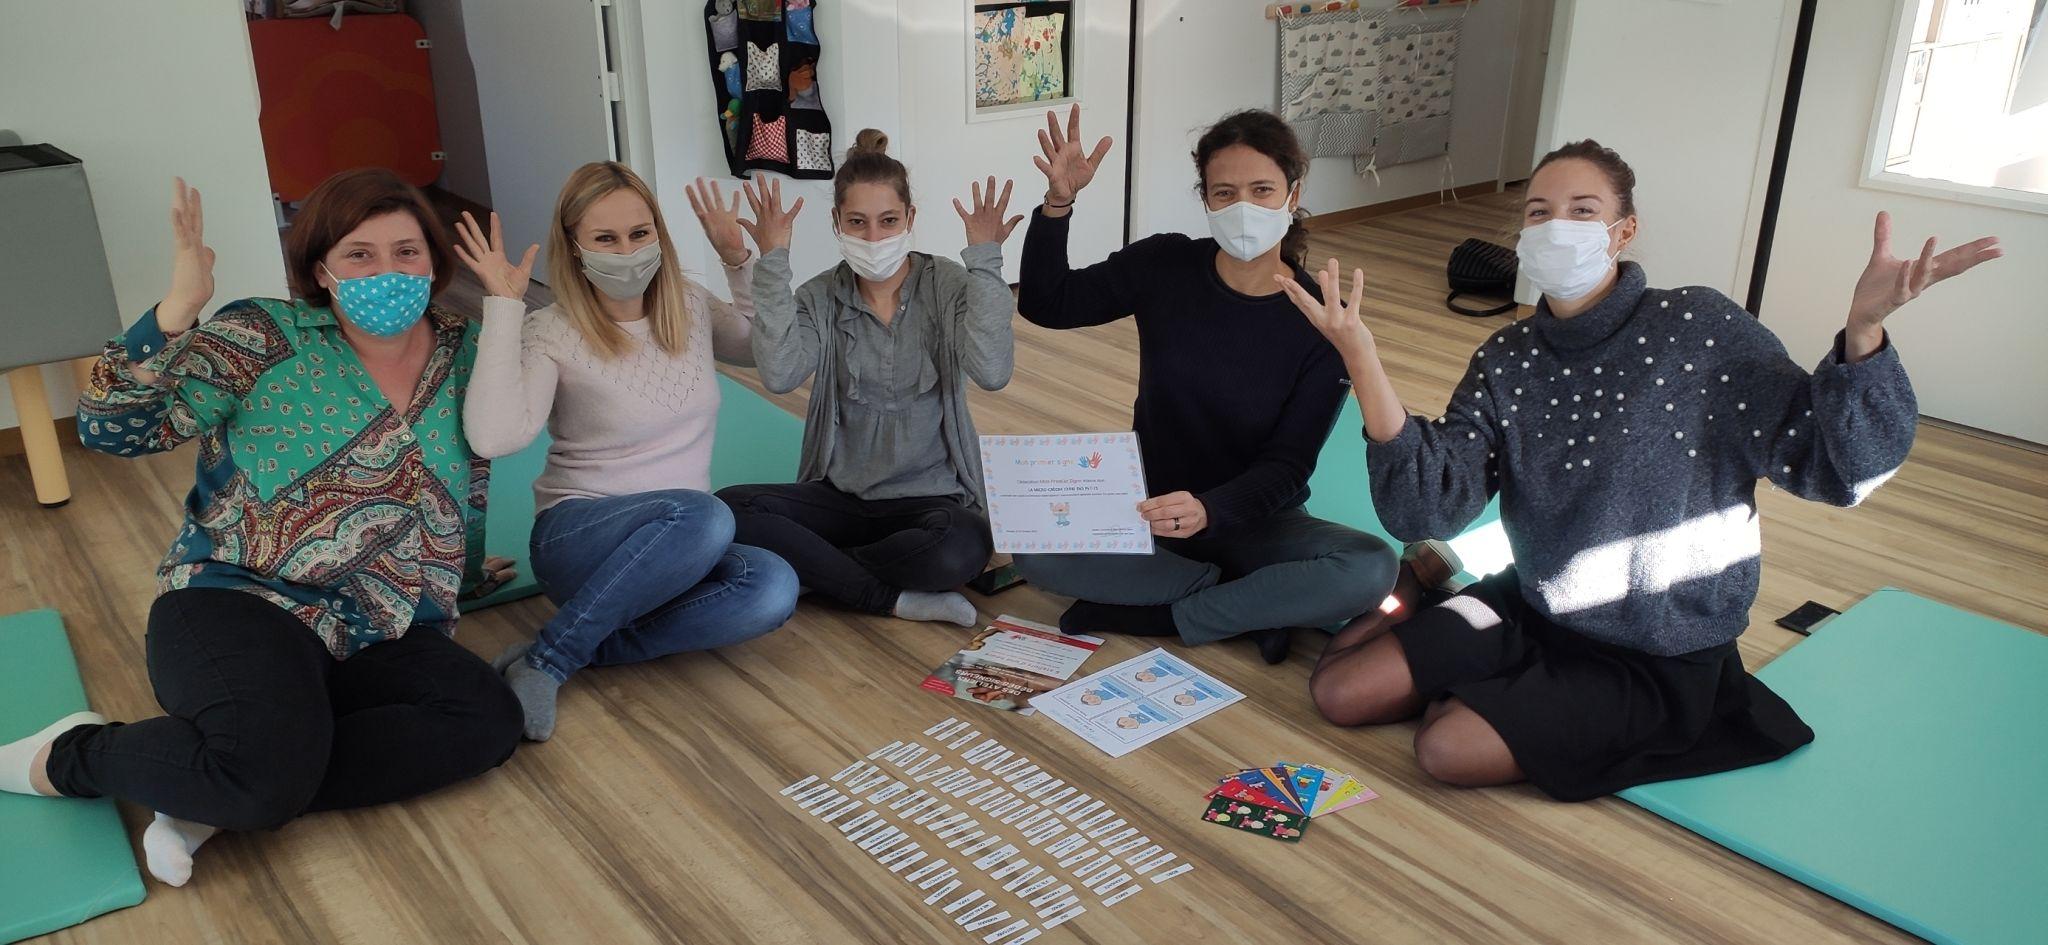 formation-langue-signes-equipe-l-abri-des-petits-labridespetits-creche-genech-templeuve-pevele-59242-ecologie-montessori